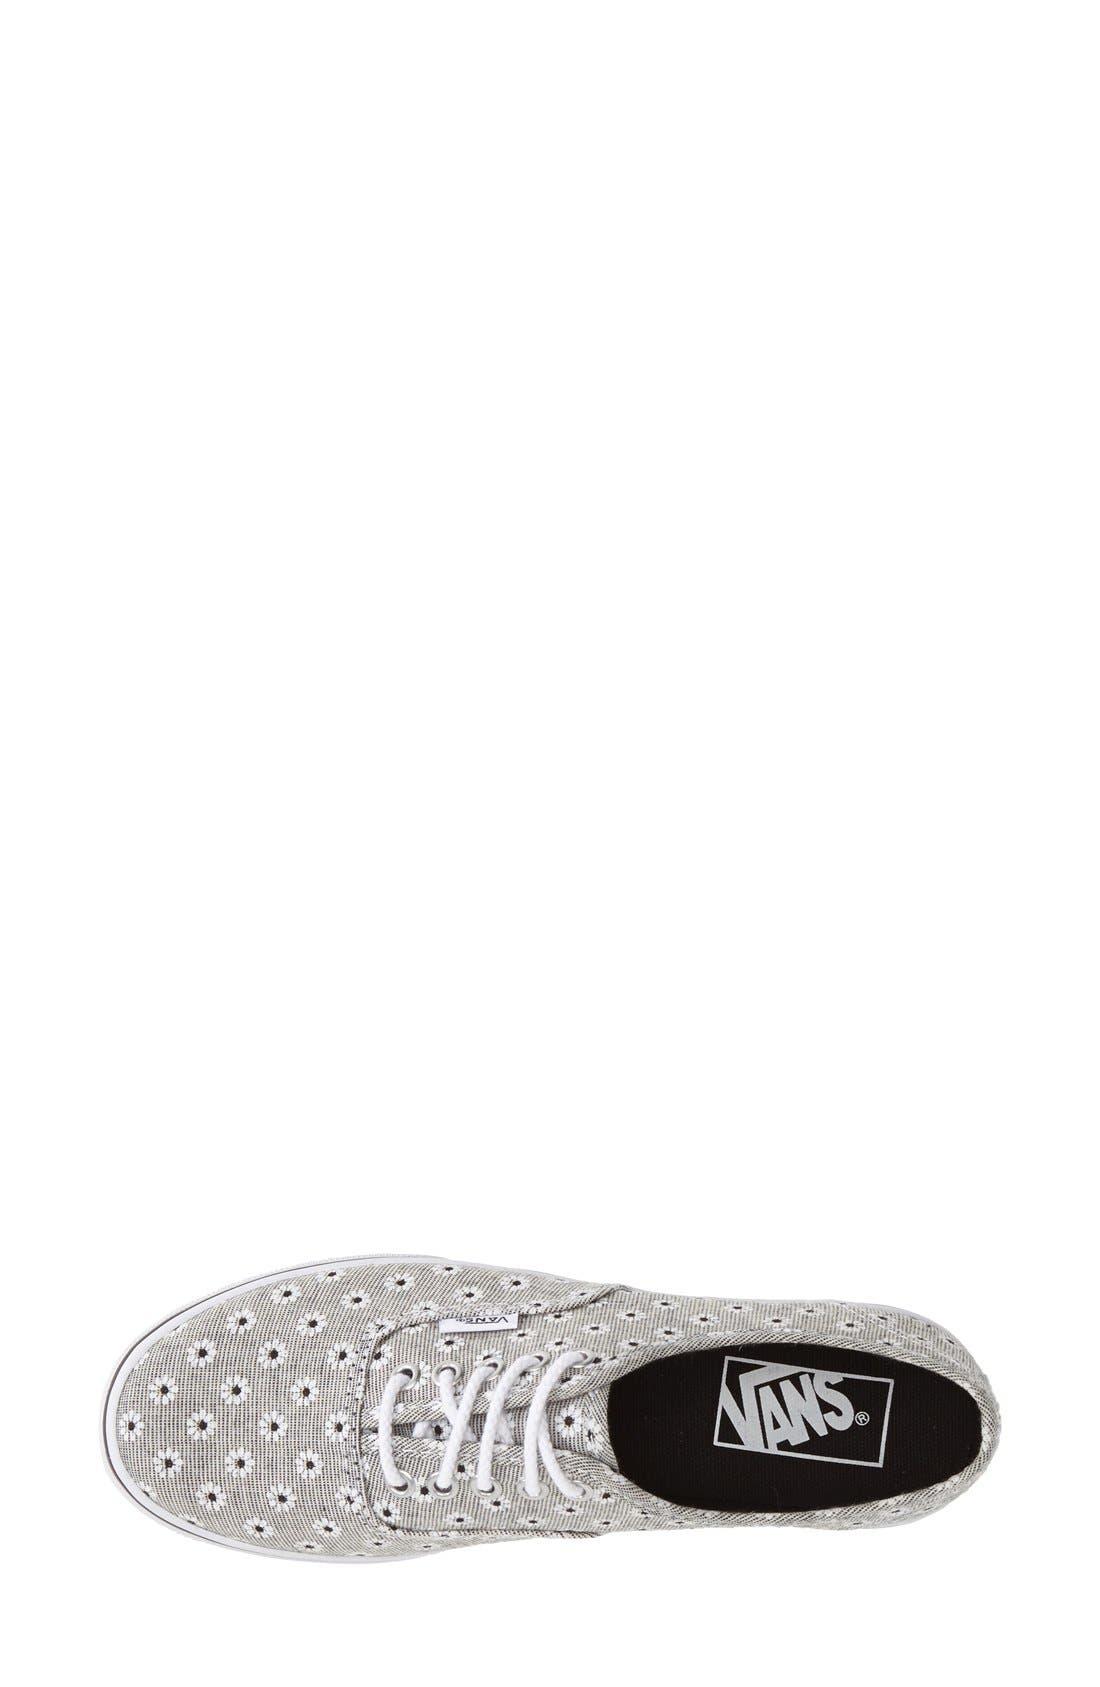 Alternate Image 3  - Vans 'Authentic - Chambray' Sneaker (Women)